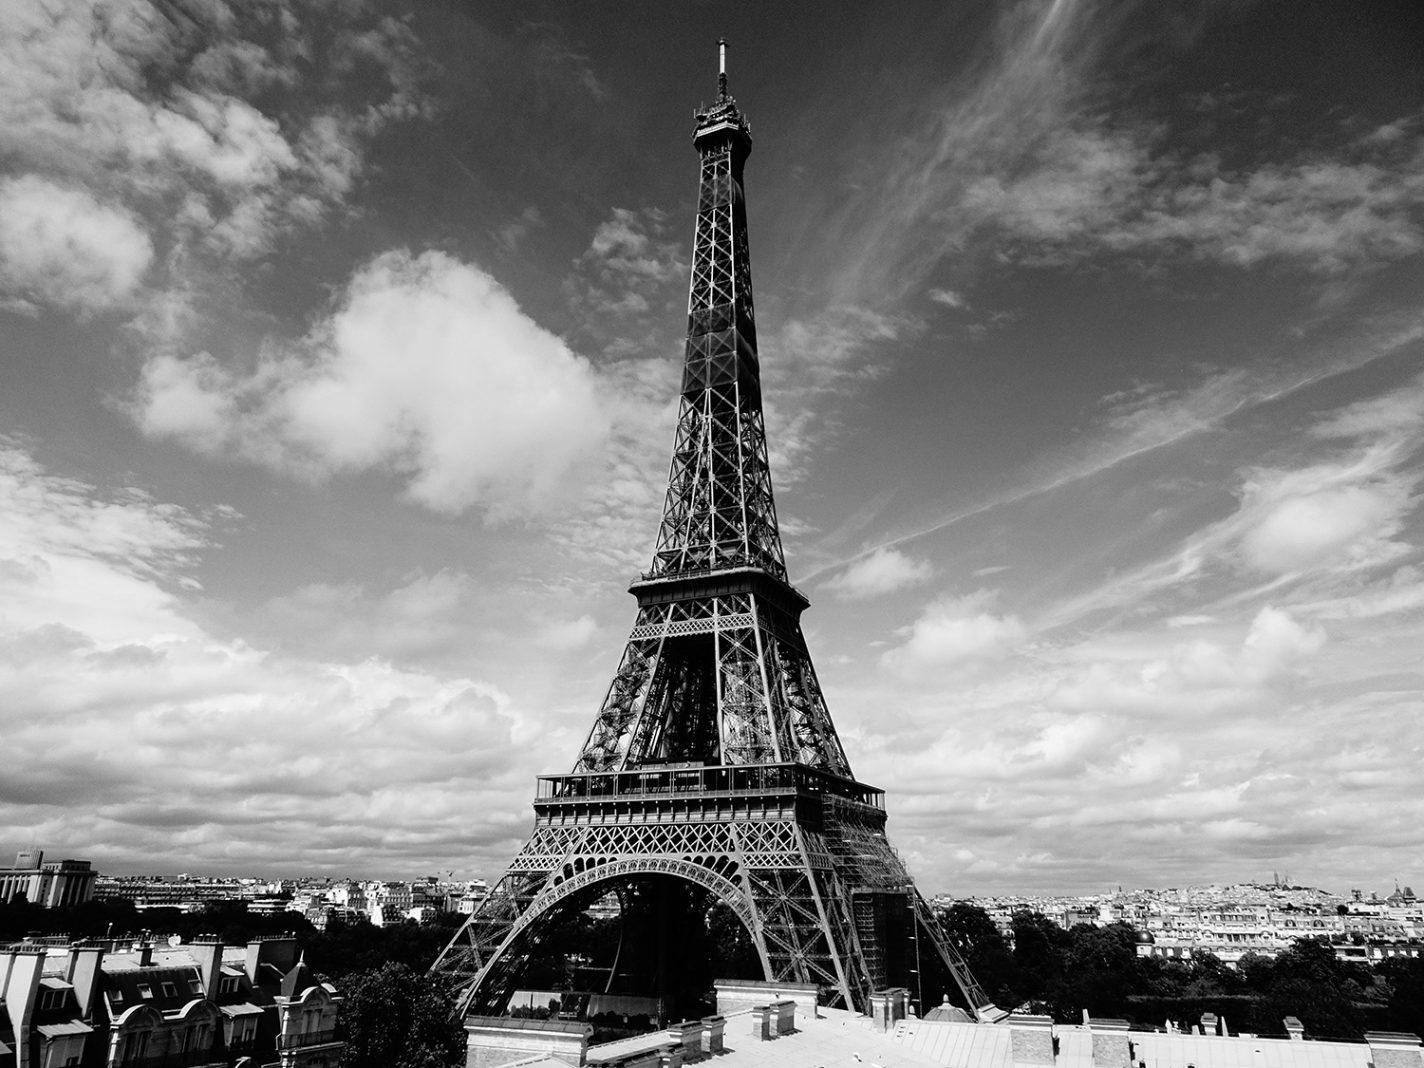 De Eiffeltoren in Parijs - mooiste Europese stad